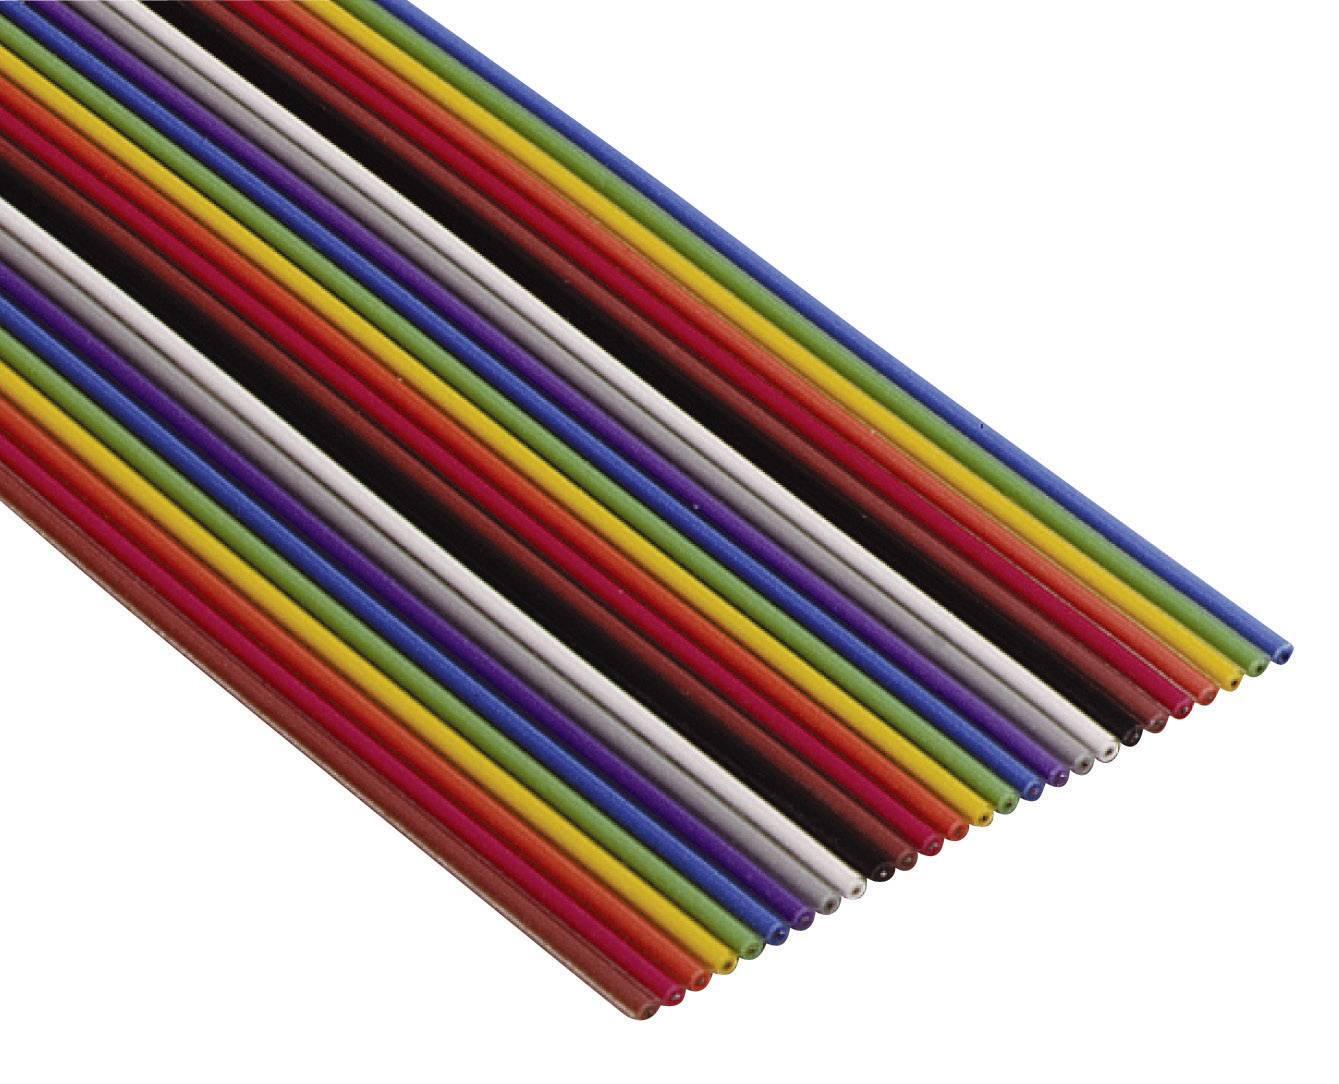 Plochý kabel 3M 3M-3302-64 SF (80610790281), nestíněný, 1 m